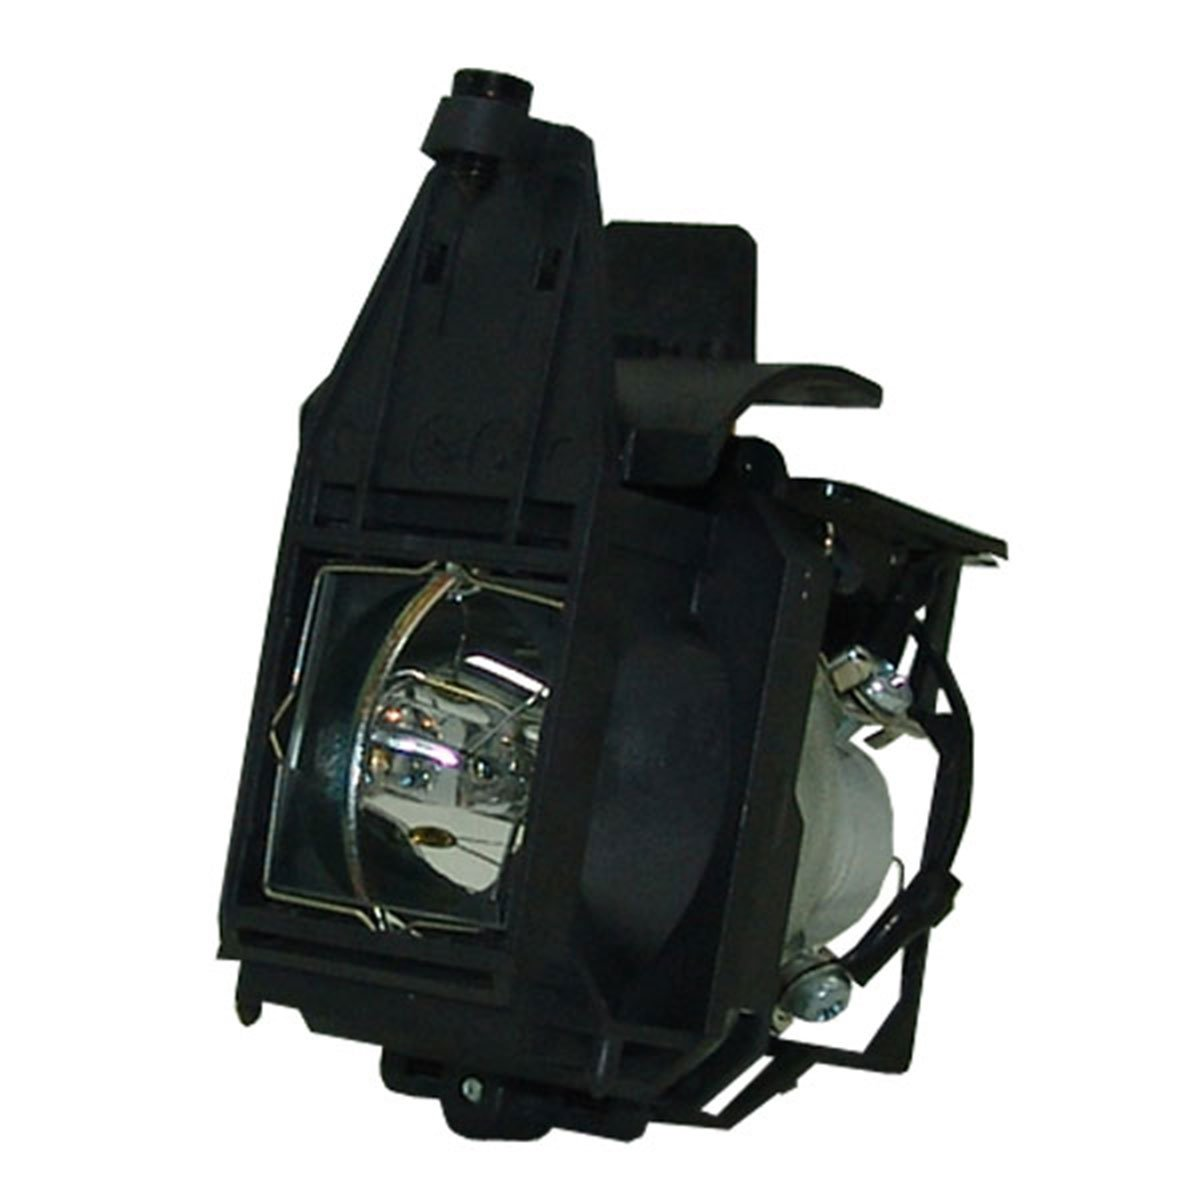 Lutema OEM プロジェクター交換用ランプ ハウジング/電球付き IBM マイクロポータブルデータ用 Platinum (Brighter/Durable) Platinum (Brighter/Durable) Lamp with Housing B07KTJMNPD